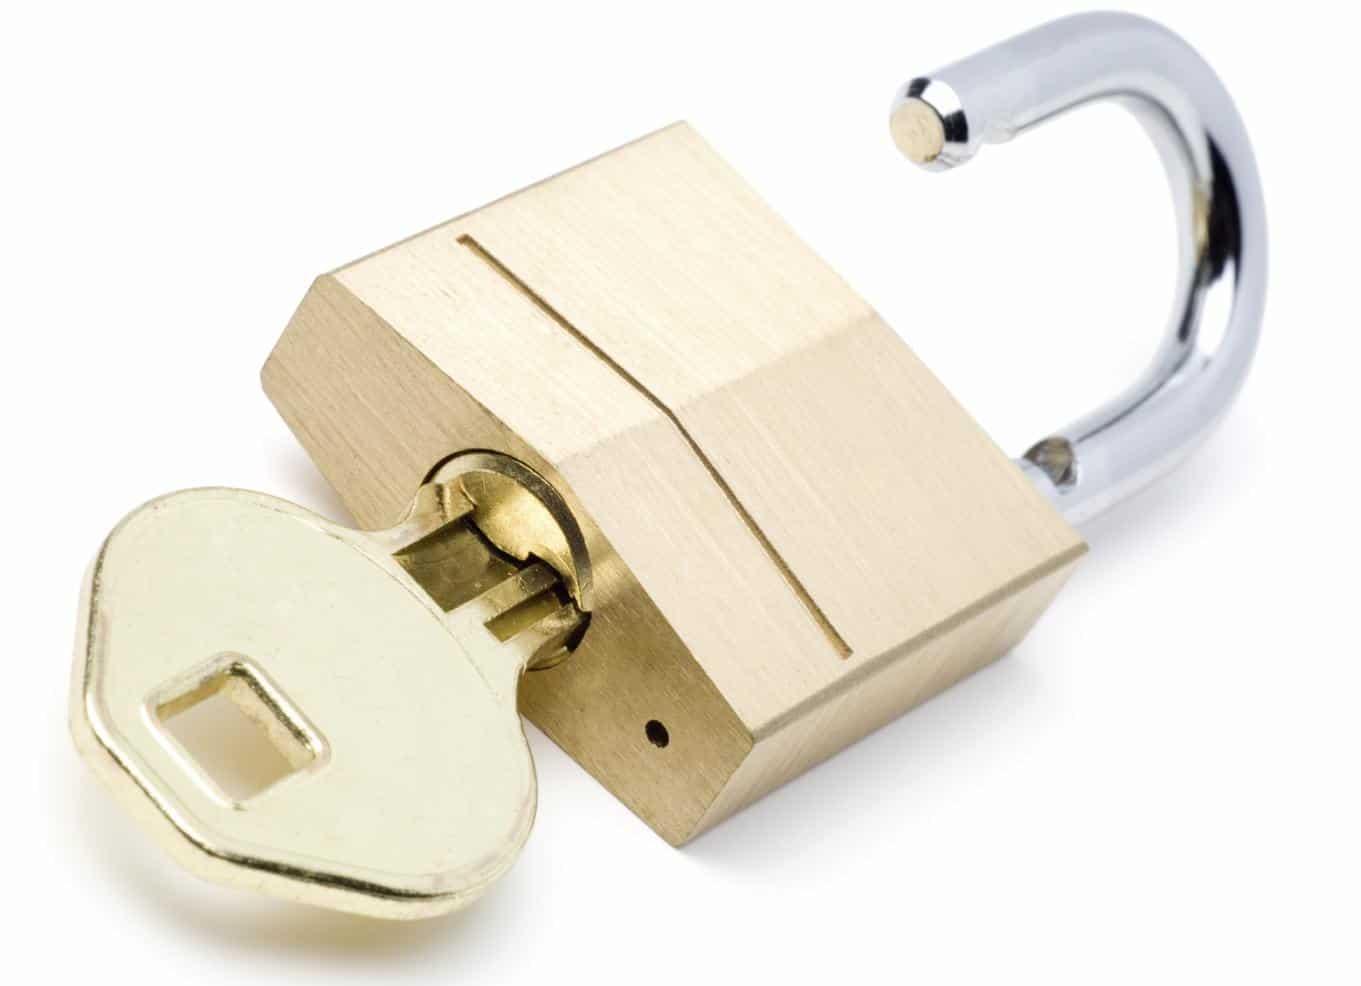 lock-and-key-chula-vista